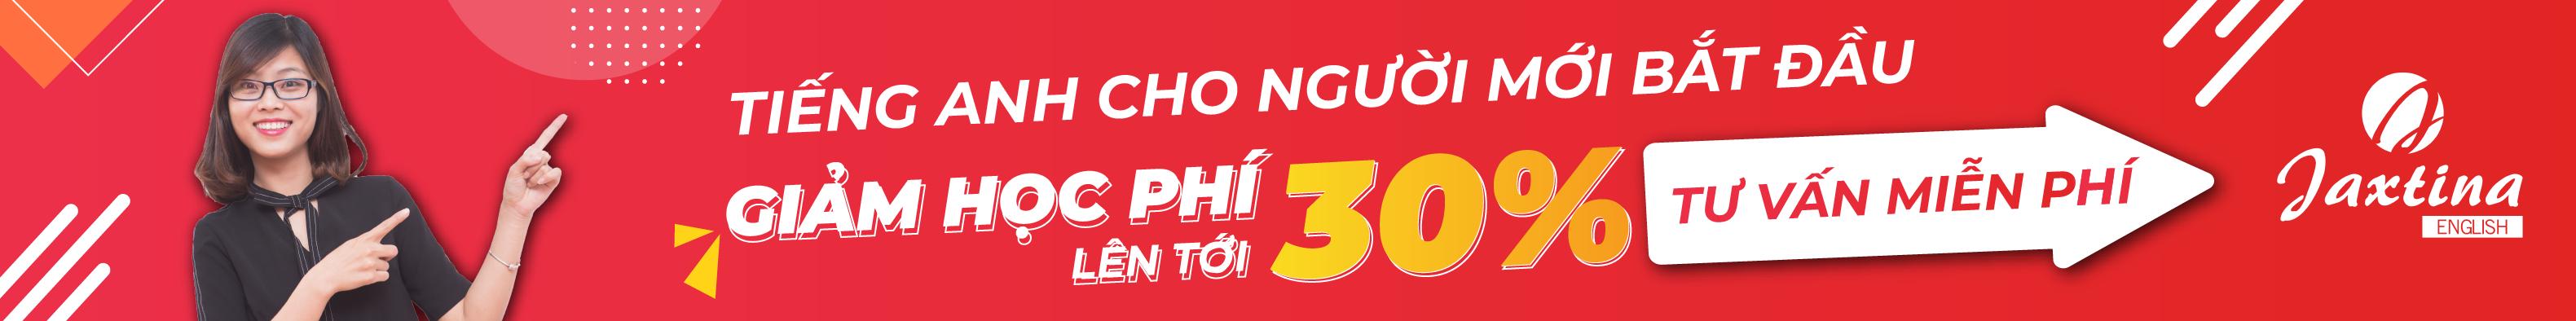 banner quảng cáo 3